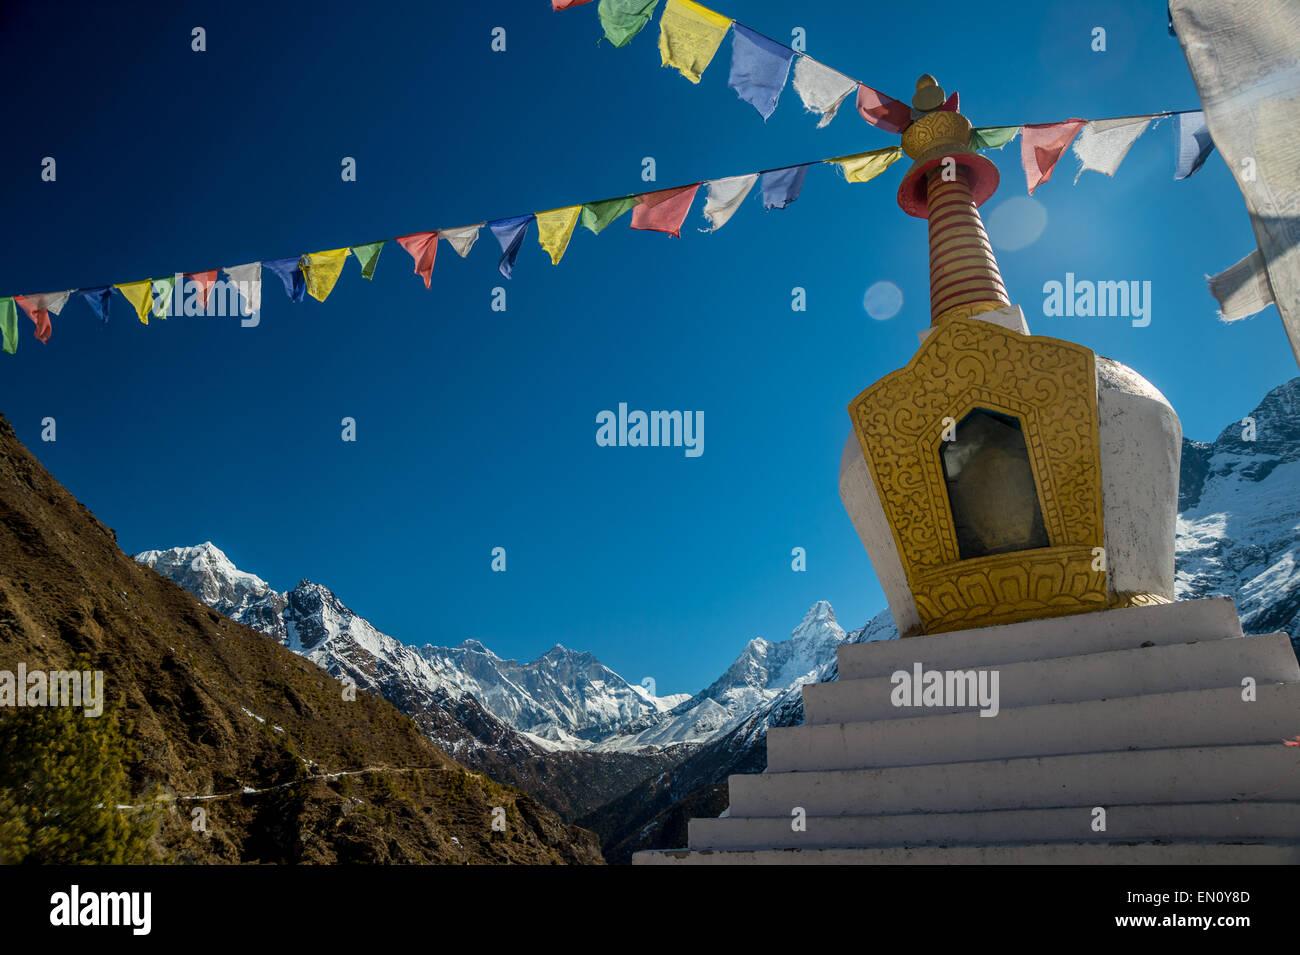 Stupa in the himalayas region - Stock Image